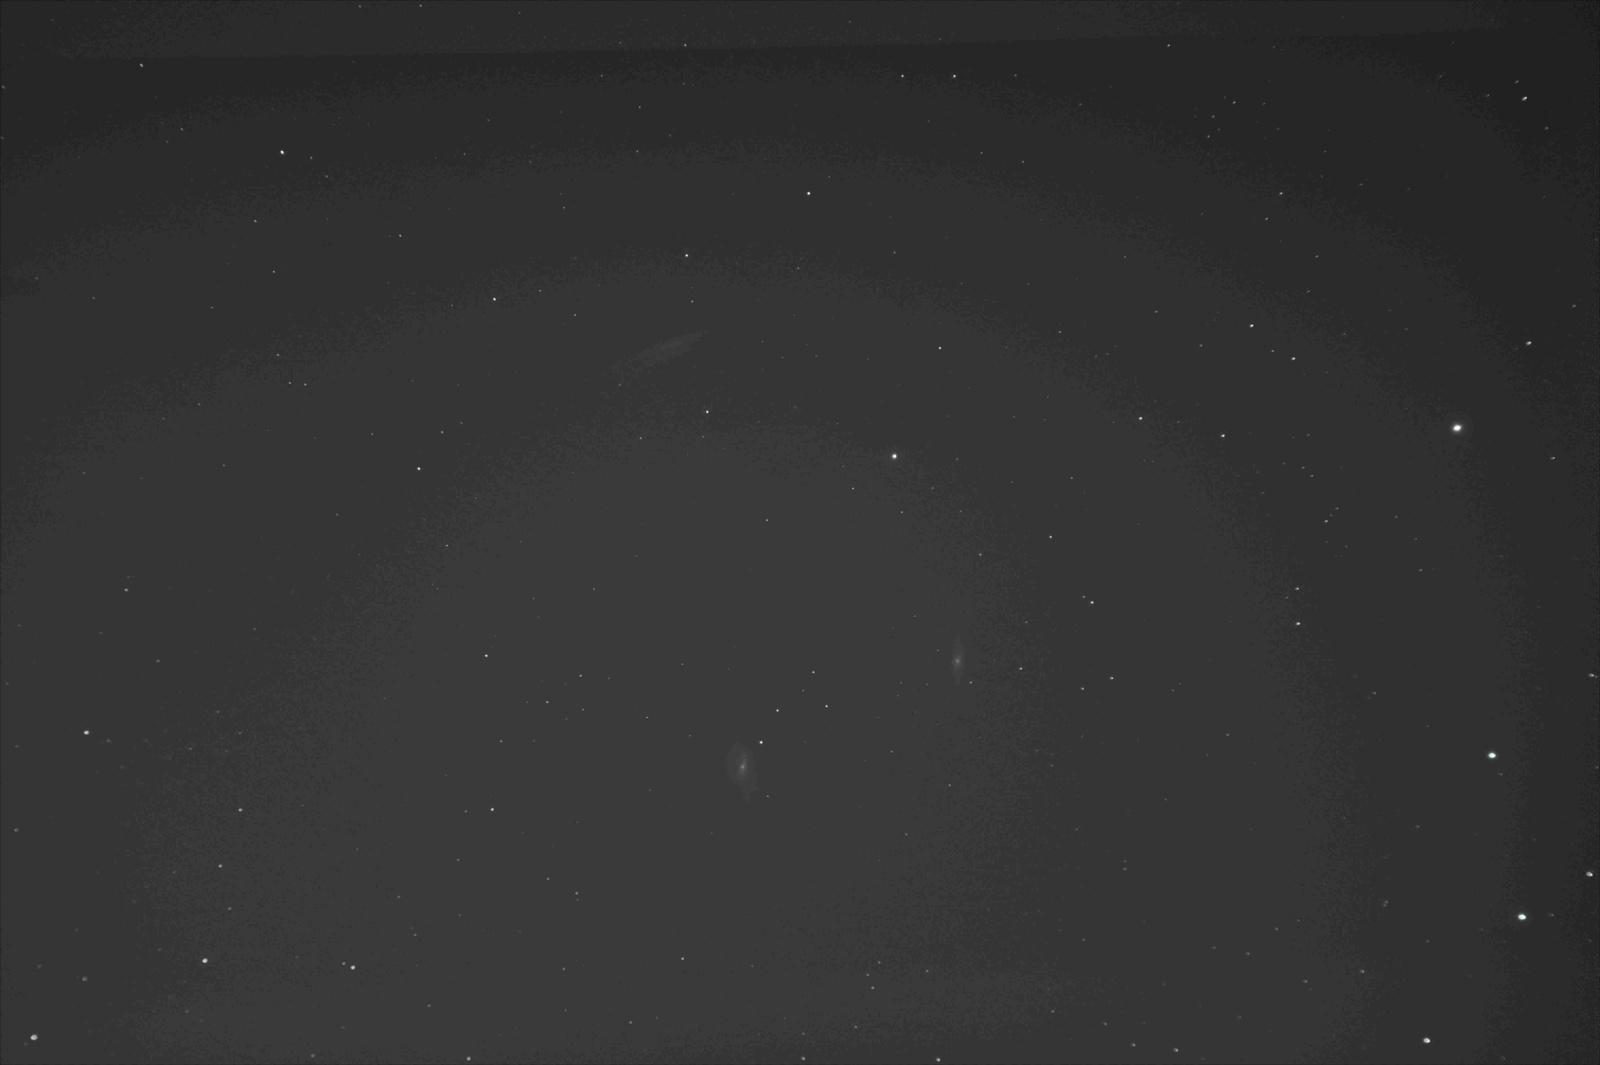 dark_wynik.thumb.jpg.e0b3e87d103f266ce32a389e92996c58.jpg